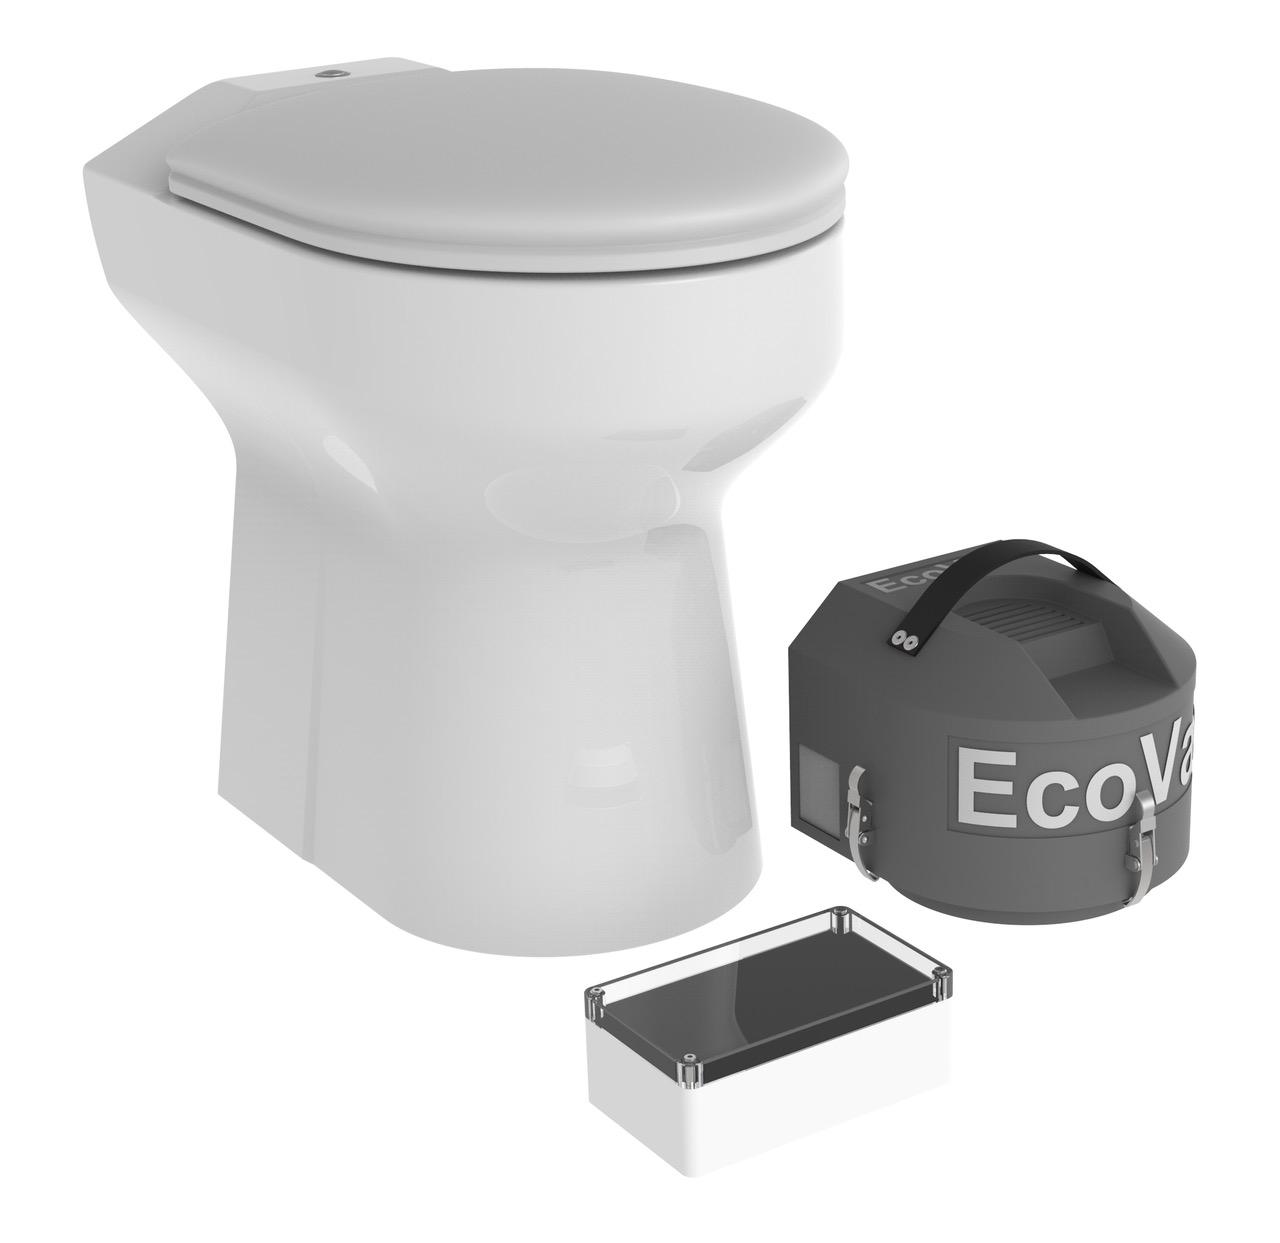 Ecovac grund utan tank-2.jpeg